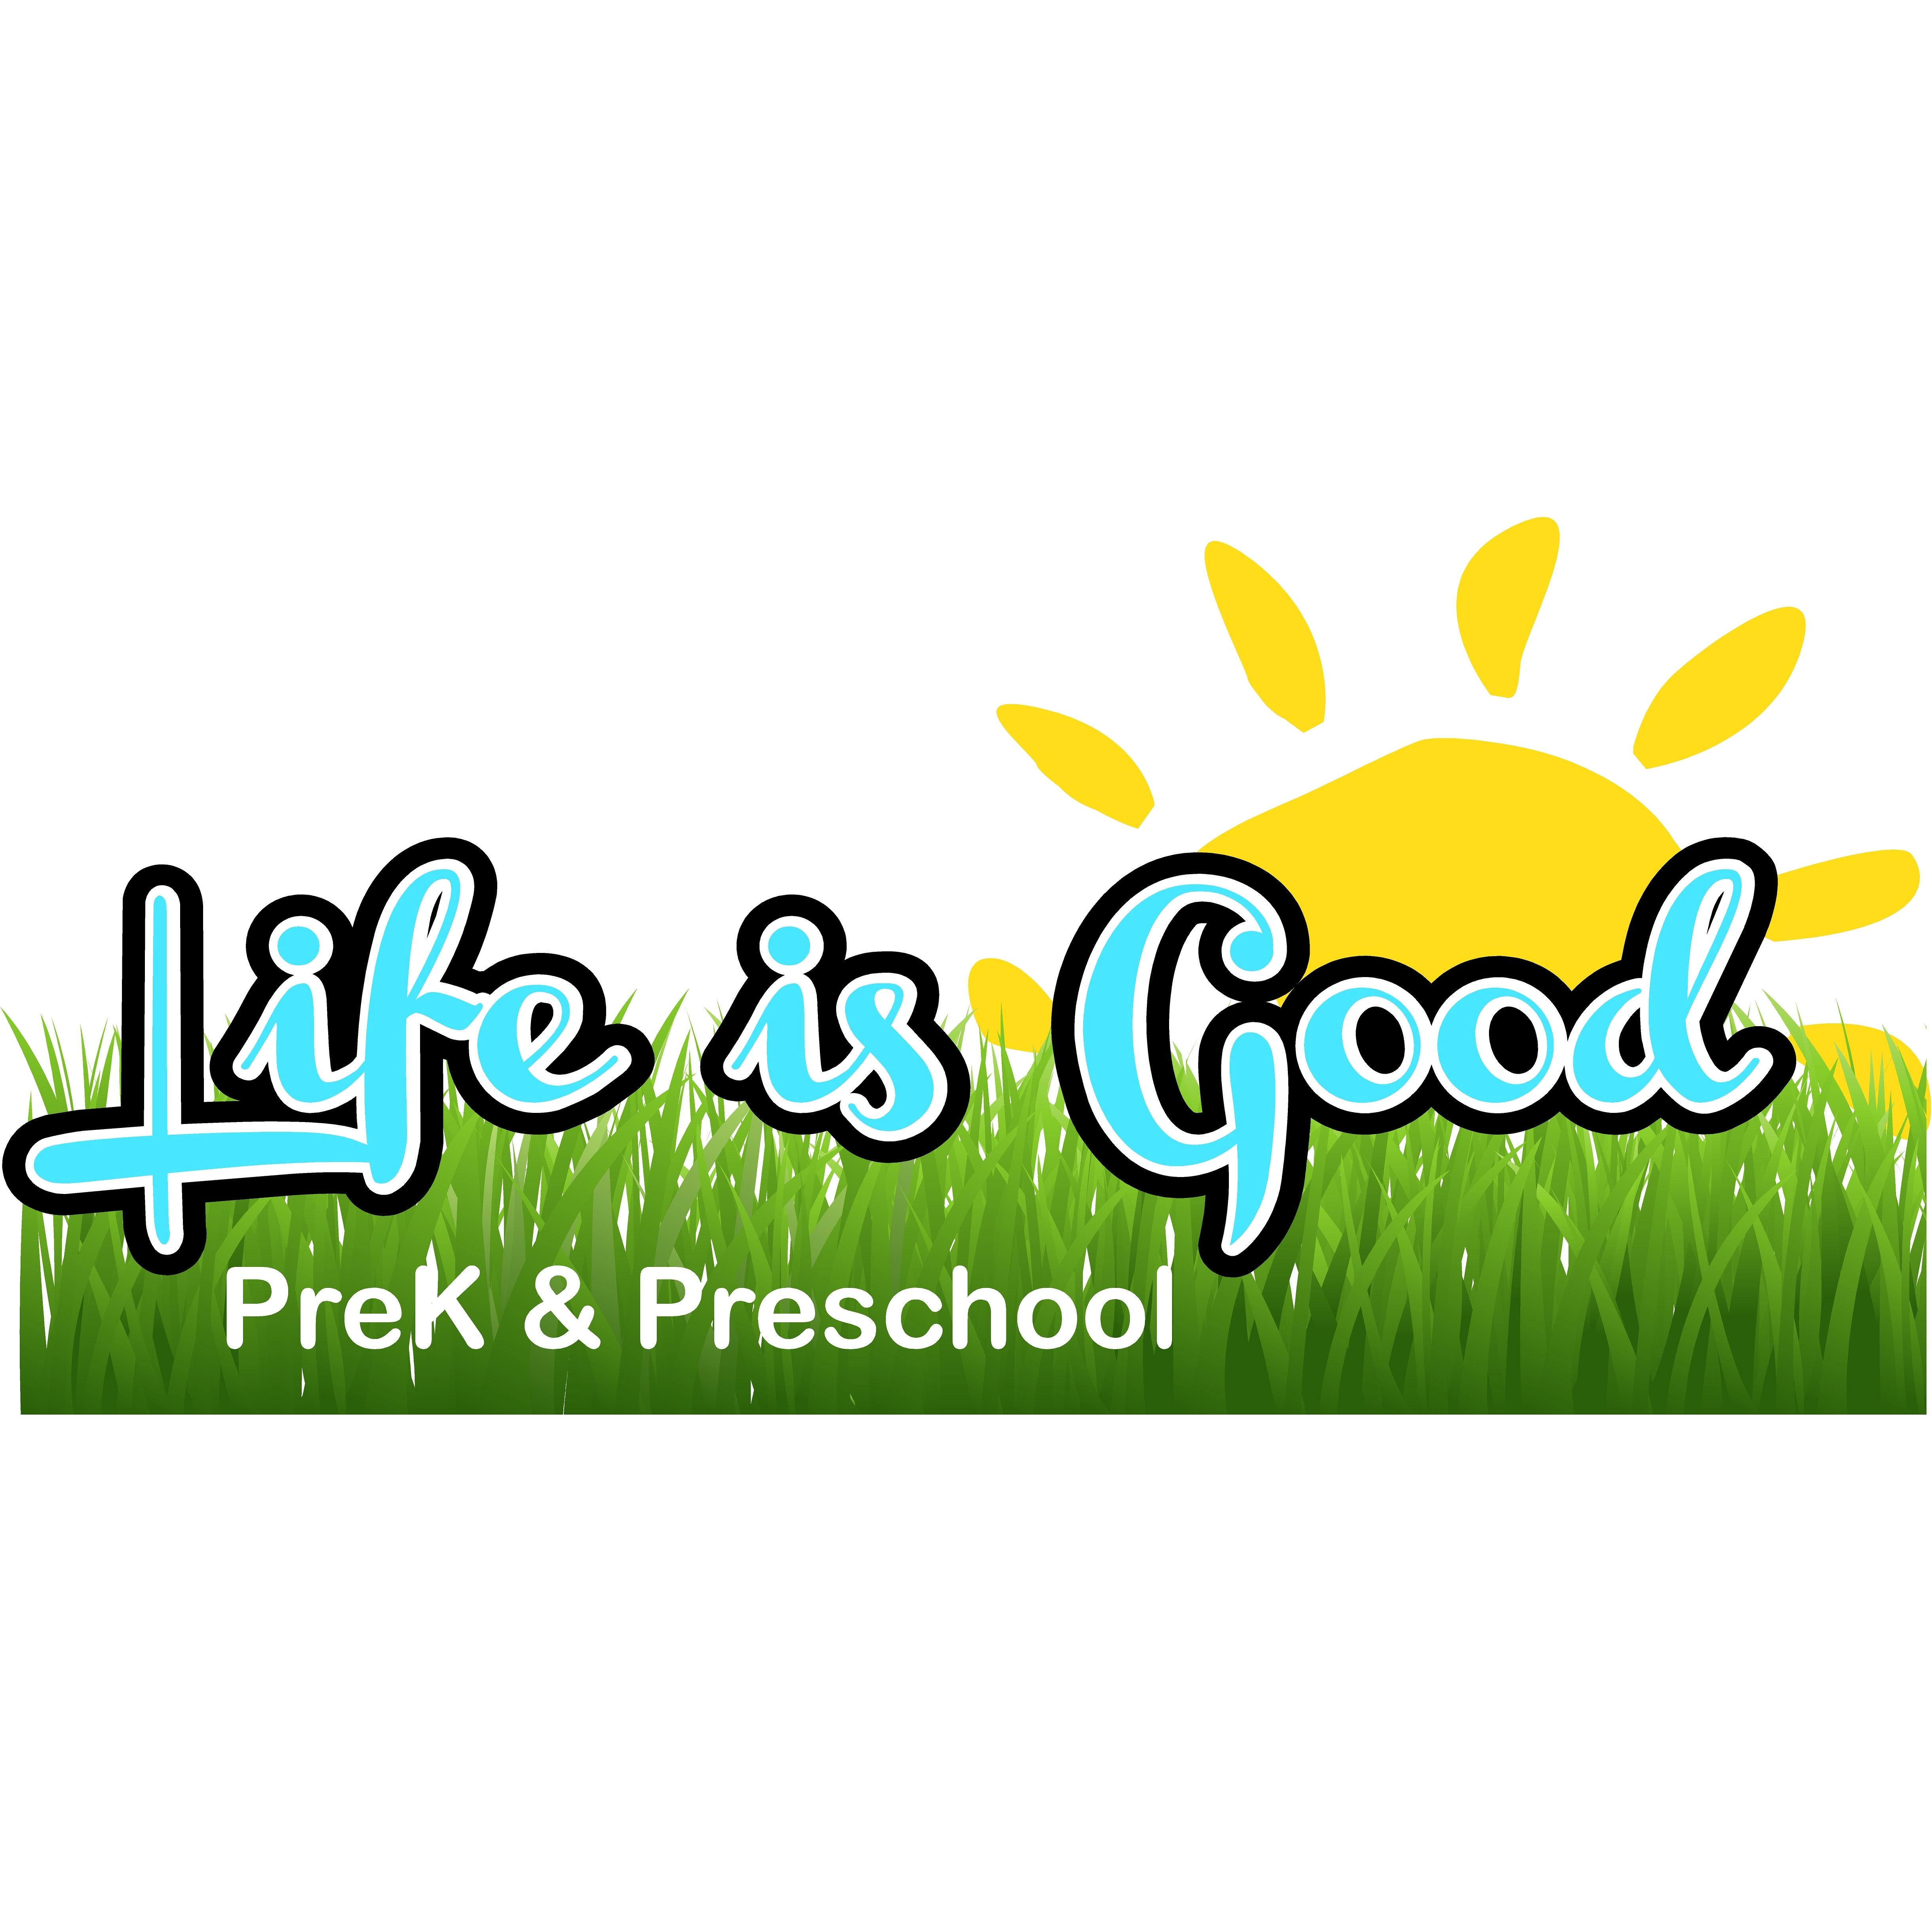 Life is Good Preschool & Pre K